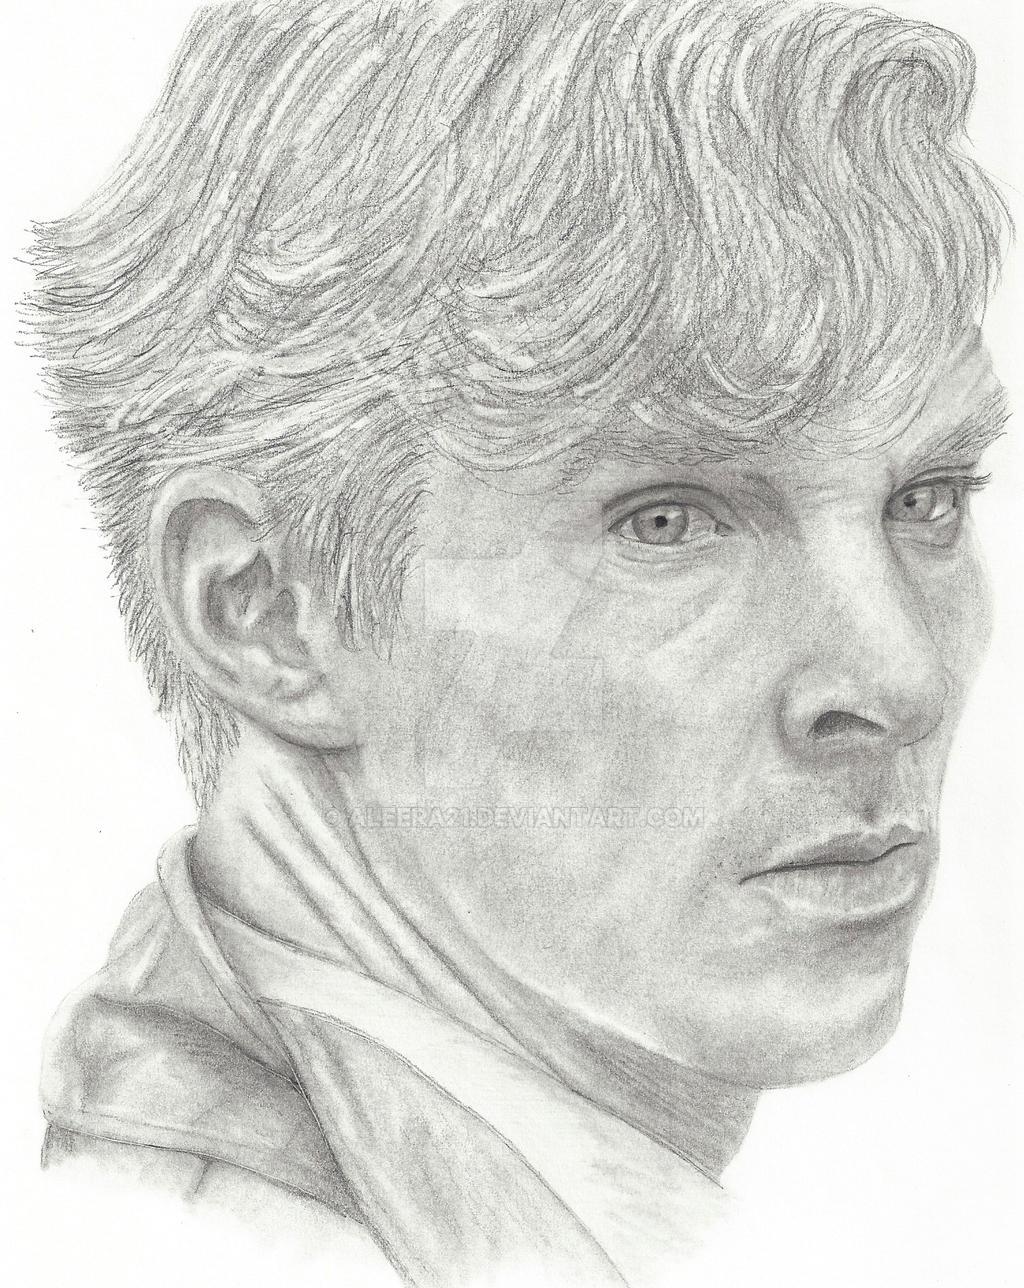 Christopher Tietjens - Benedict Cumberbatch